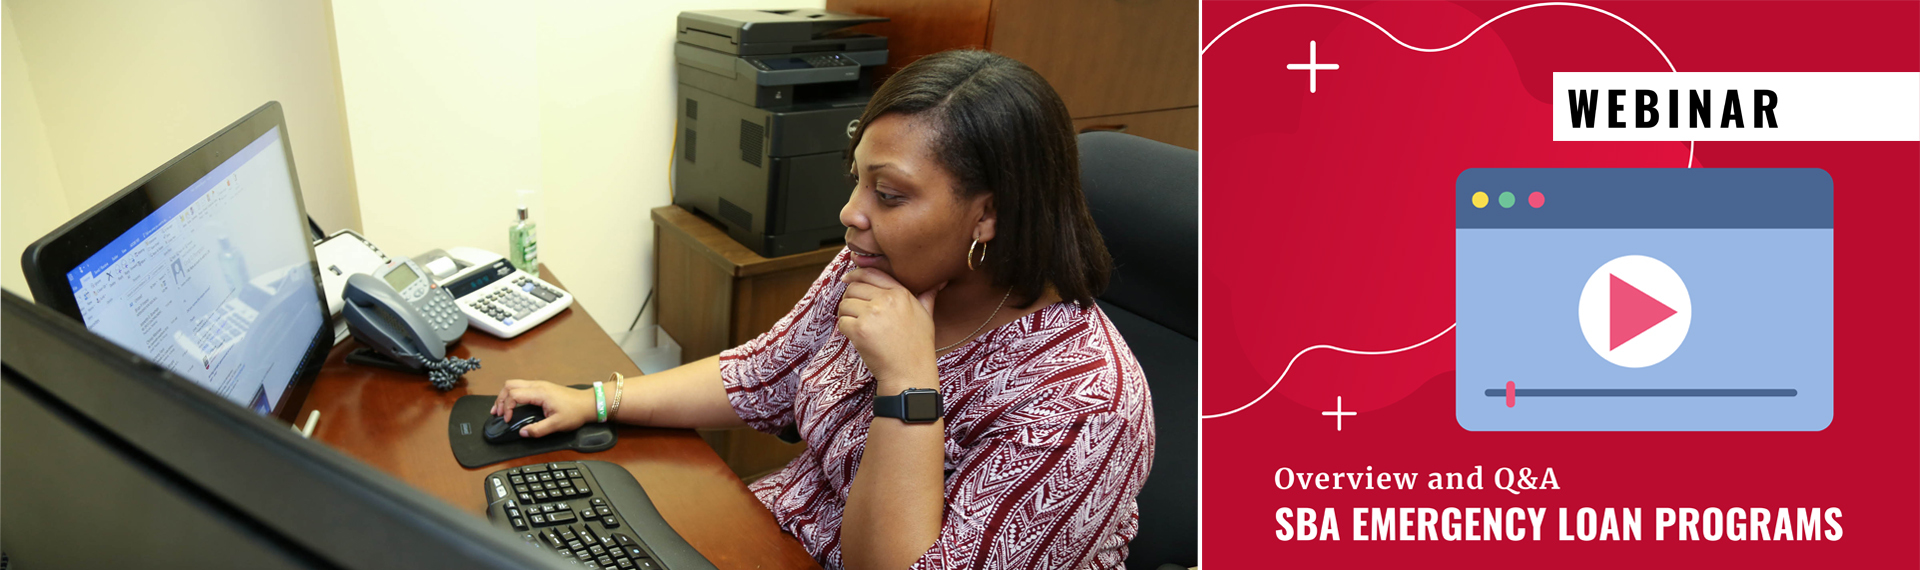 UGA SBDC provides webinars for small businesses seeking COVID-19 help